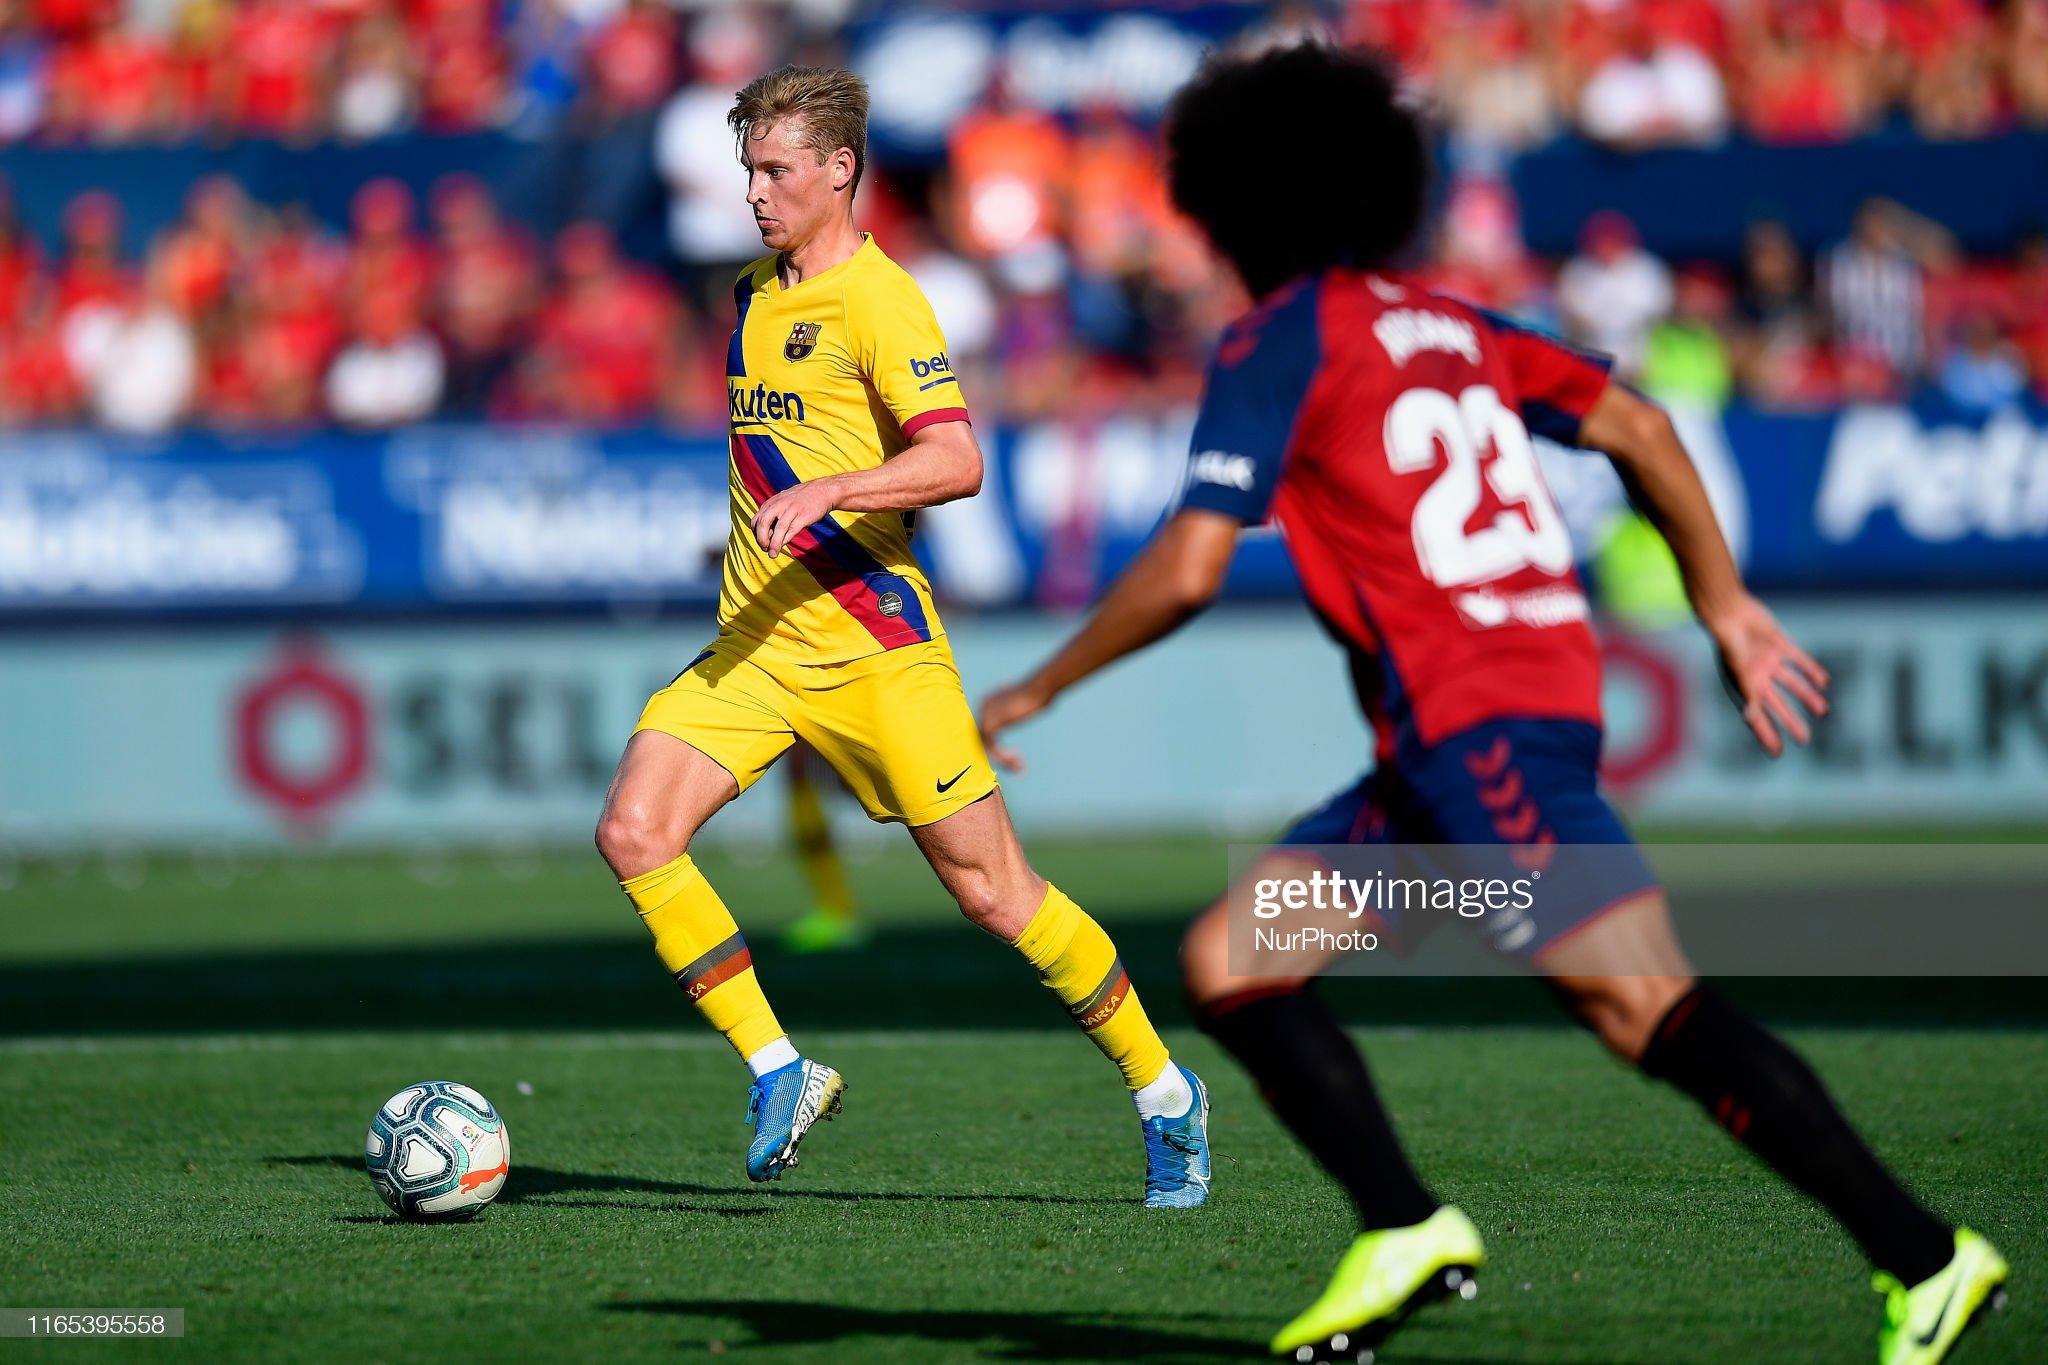 صور مباراة : أوساسونا - برشلونة 2-2 ( 31-08-2019 )  Frenkie-de-jong-of-barcelona-in-action-during-the-liga-match-between-picture-id1165395558?s=2048x2048